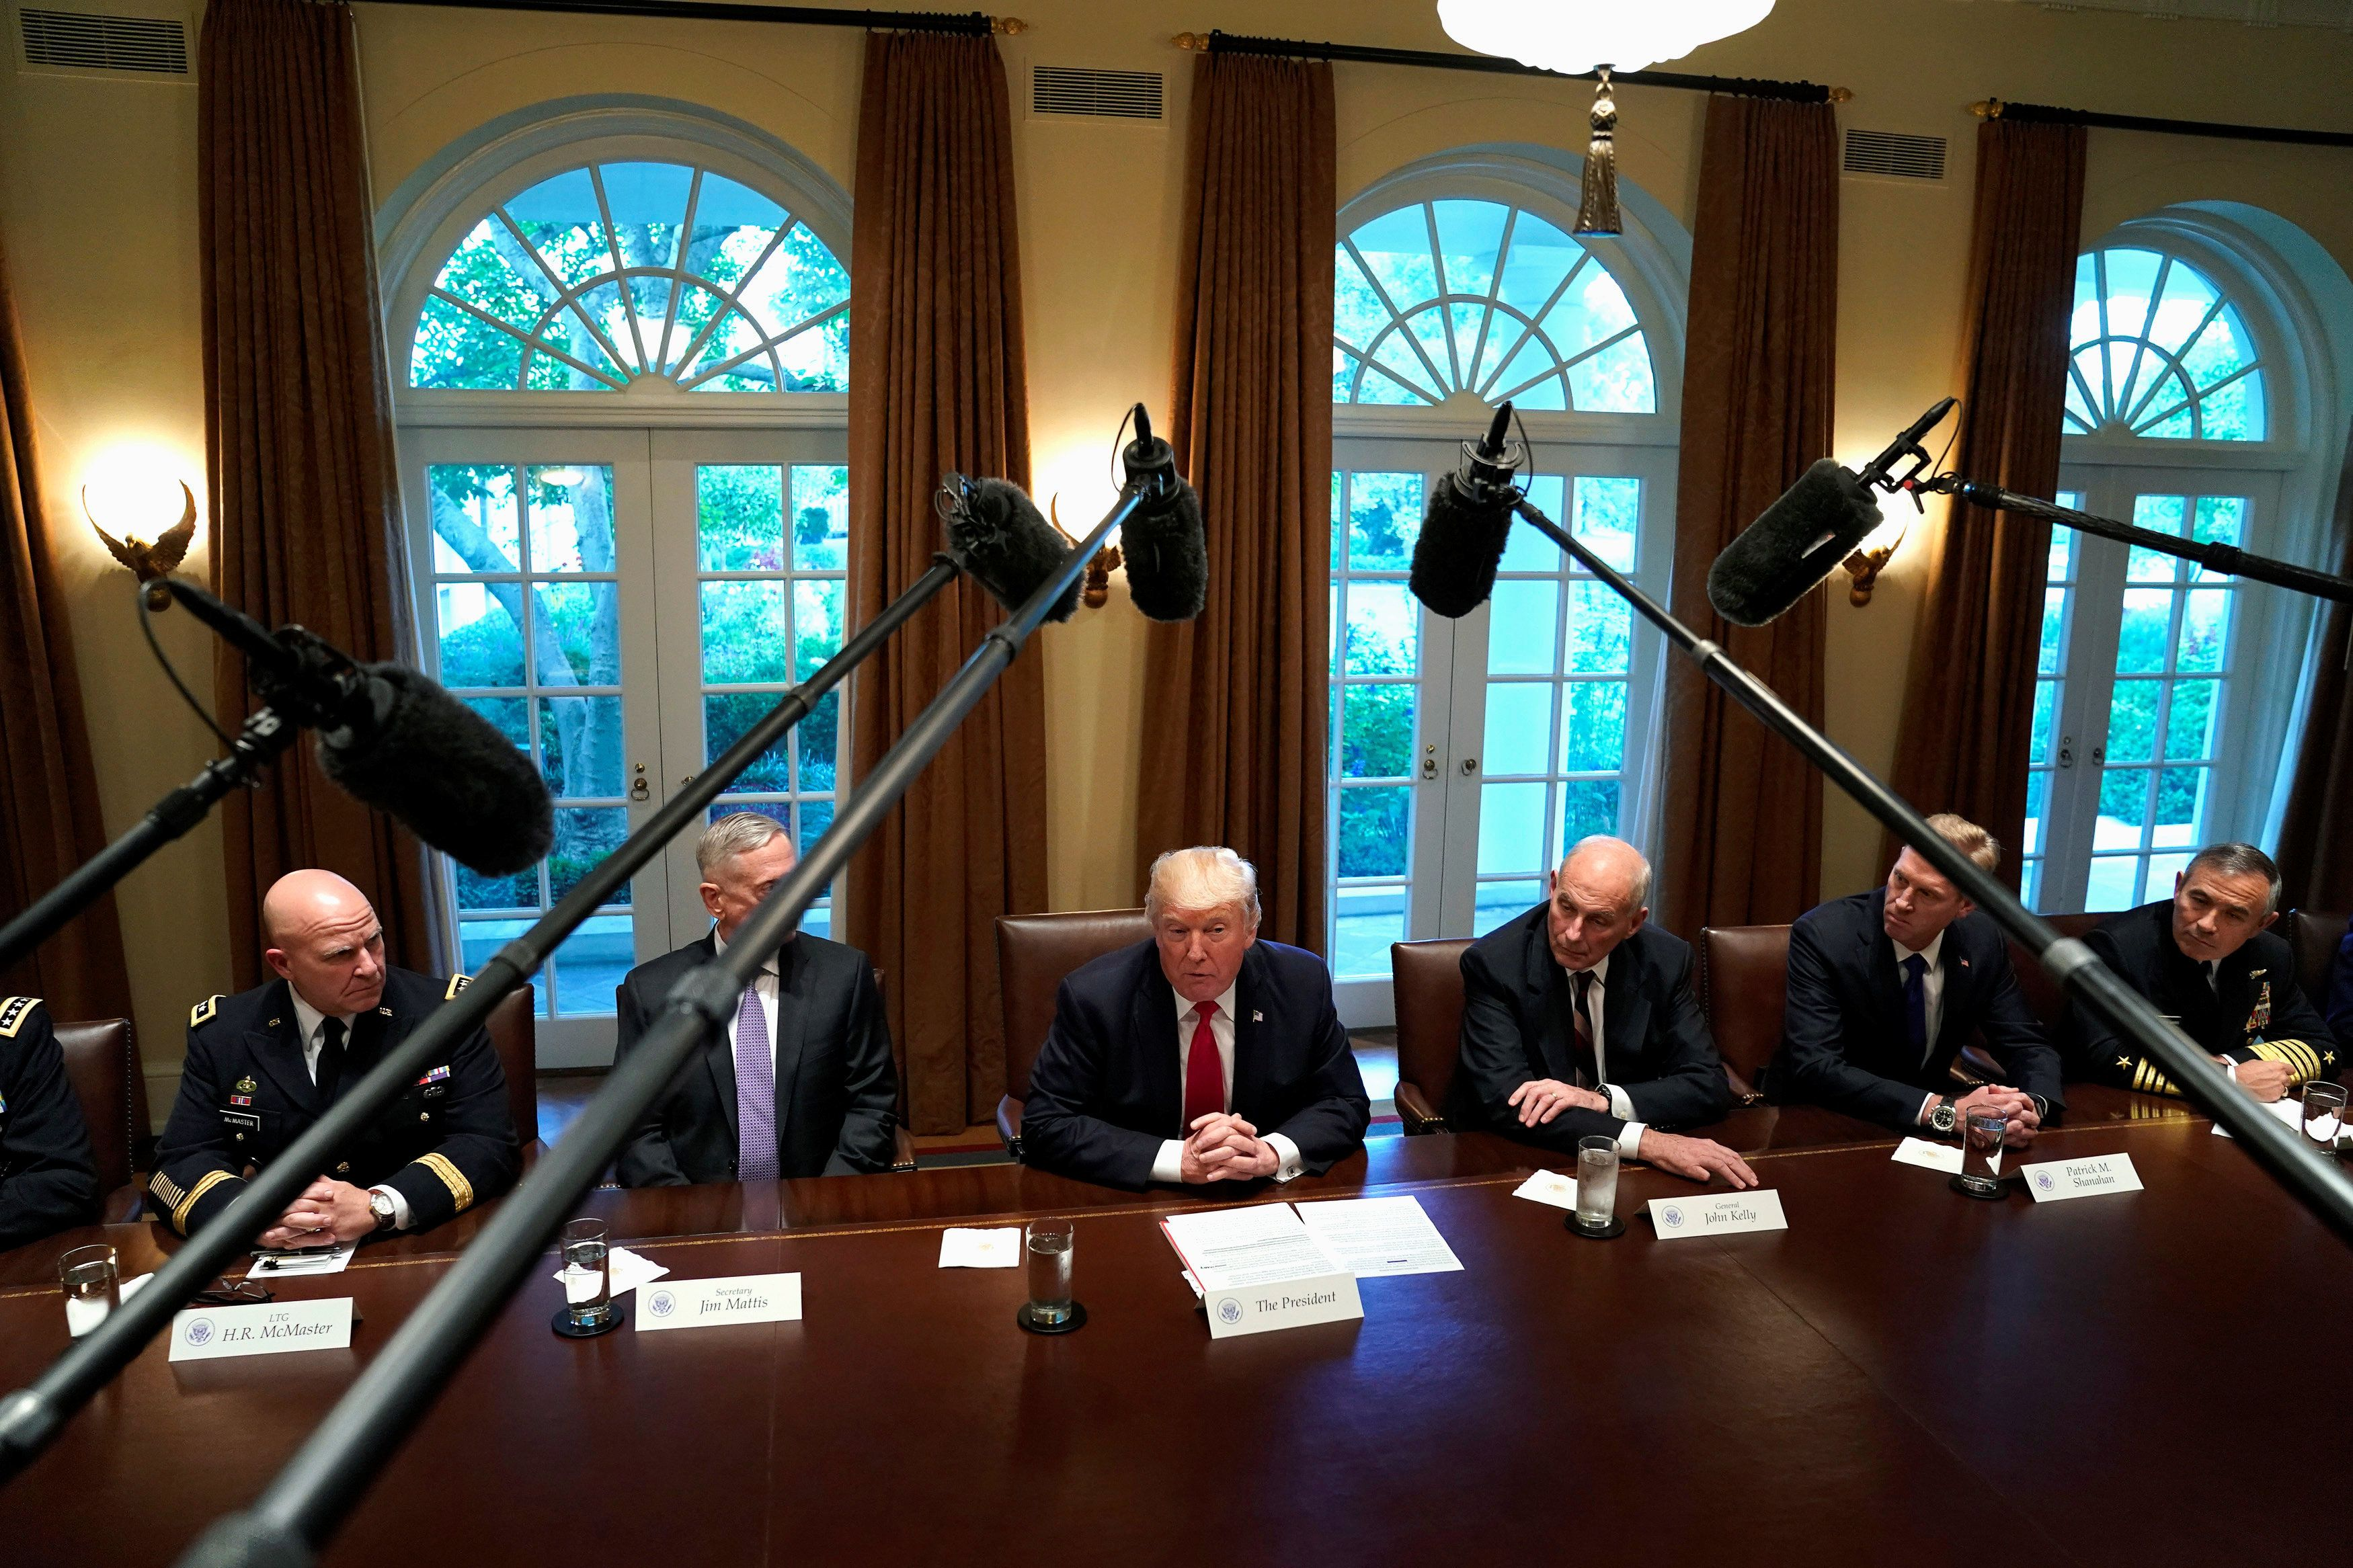 Trump and his senior military advisors on